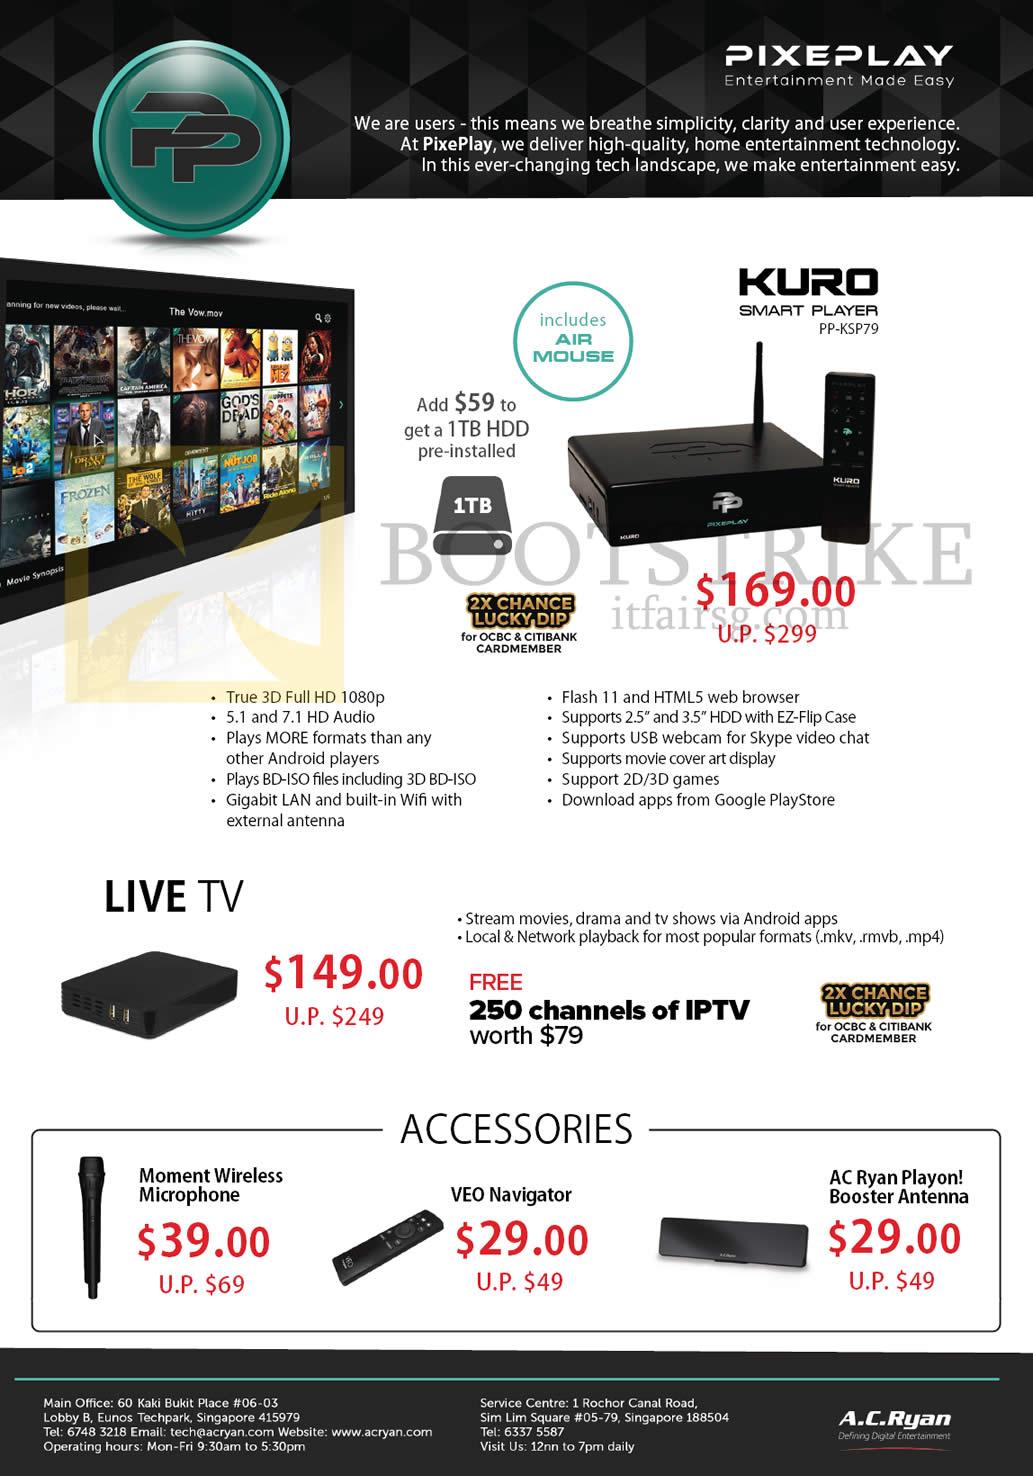 SITEX 2015 price list image brochure of AC Ryan Kuro PP-KSP79 Smart Player, Live TV, Accessories